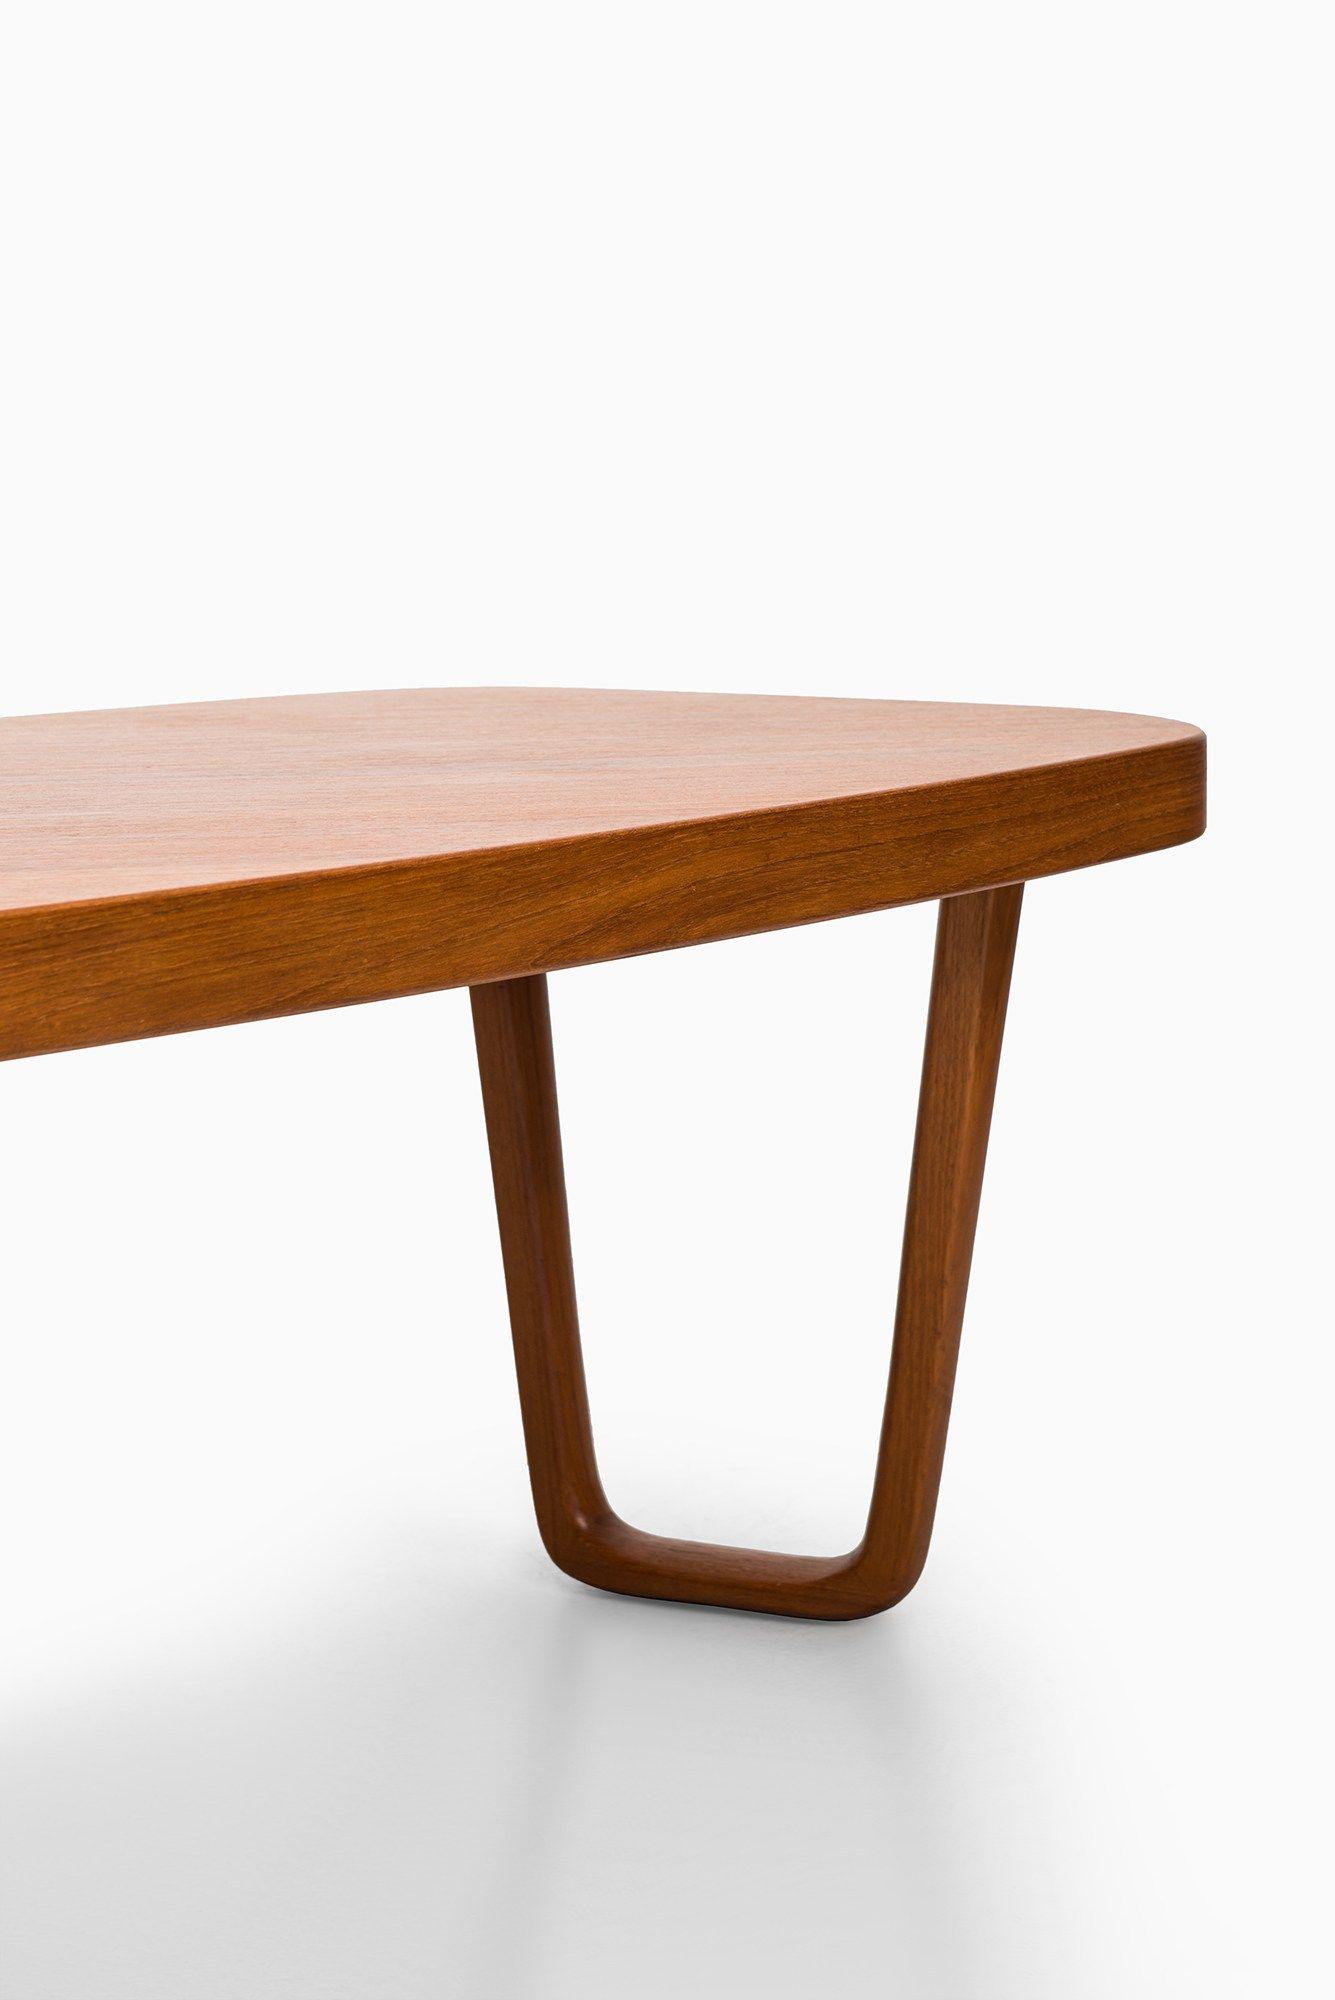 Albert Larsson Coffee Table Studio Schalling Coffee Table Table Large Coffee Tables [ 2000 x 1335 Pixel ]